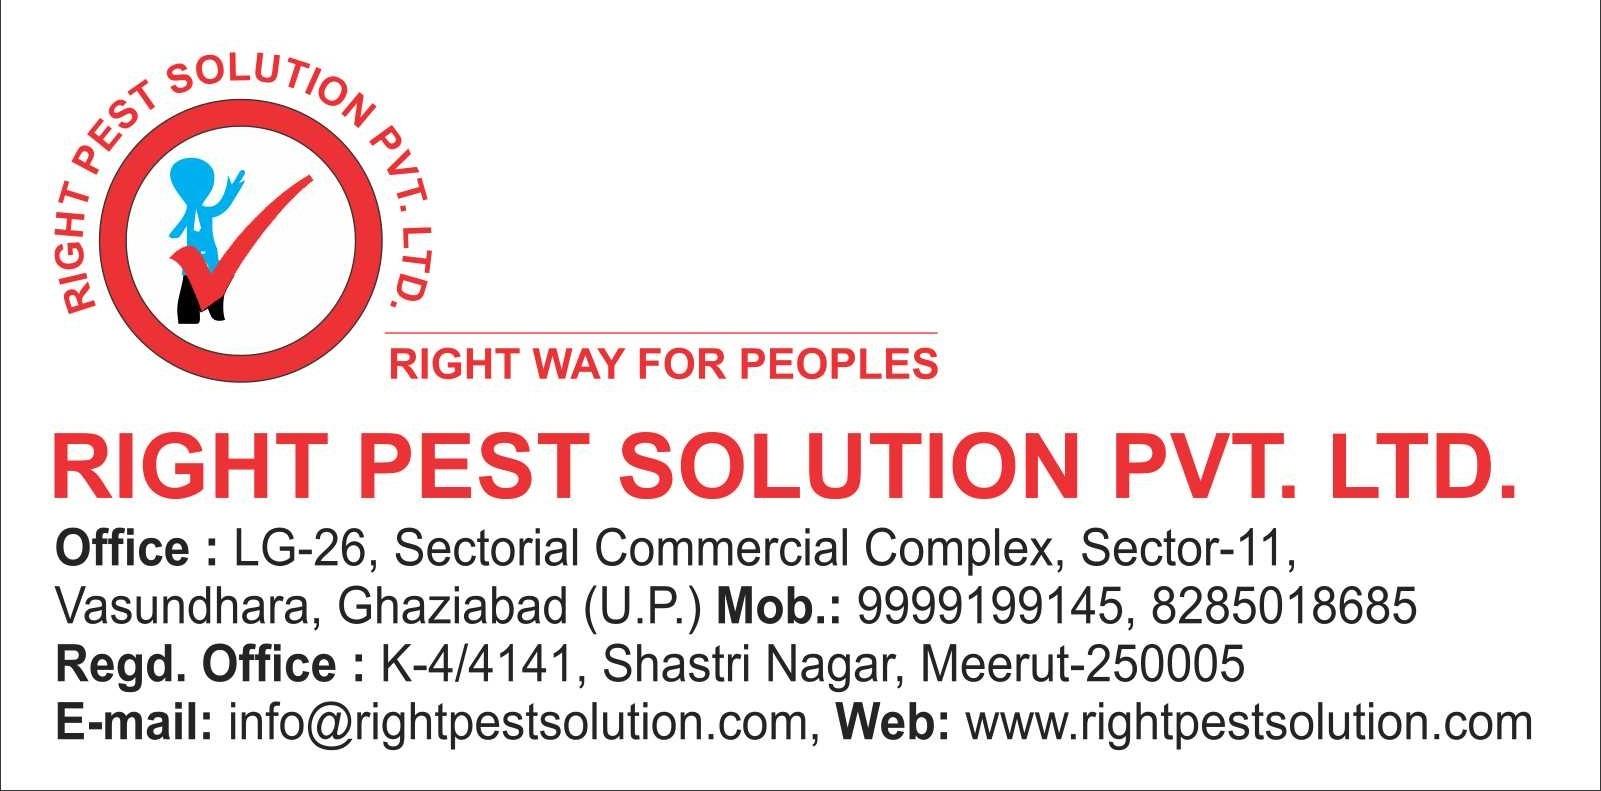 Right Pest Solution Pvt Ltd